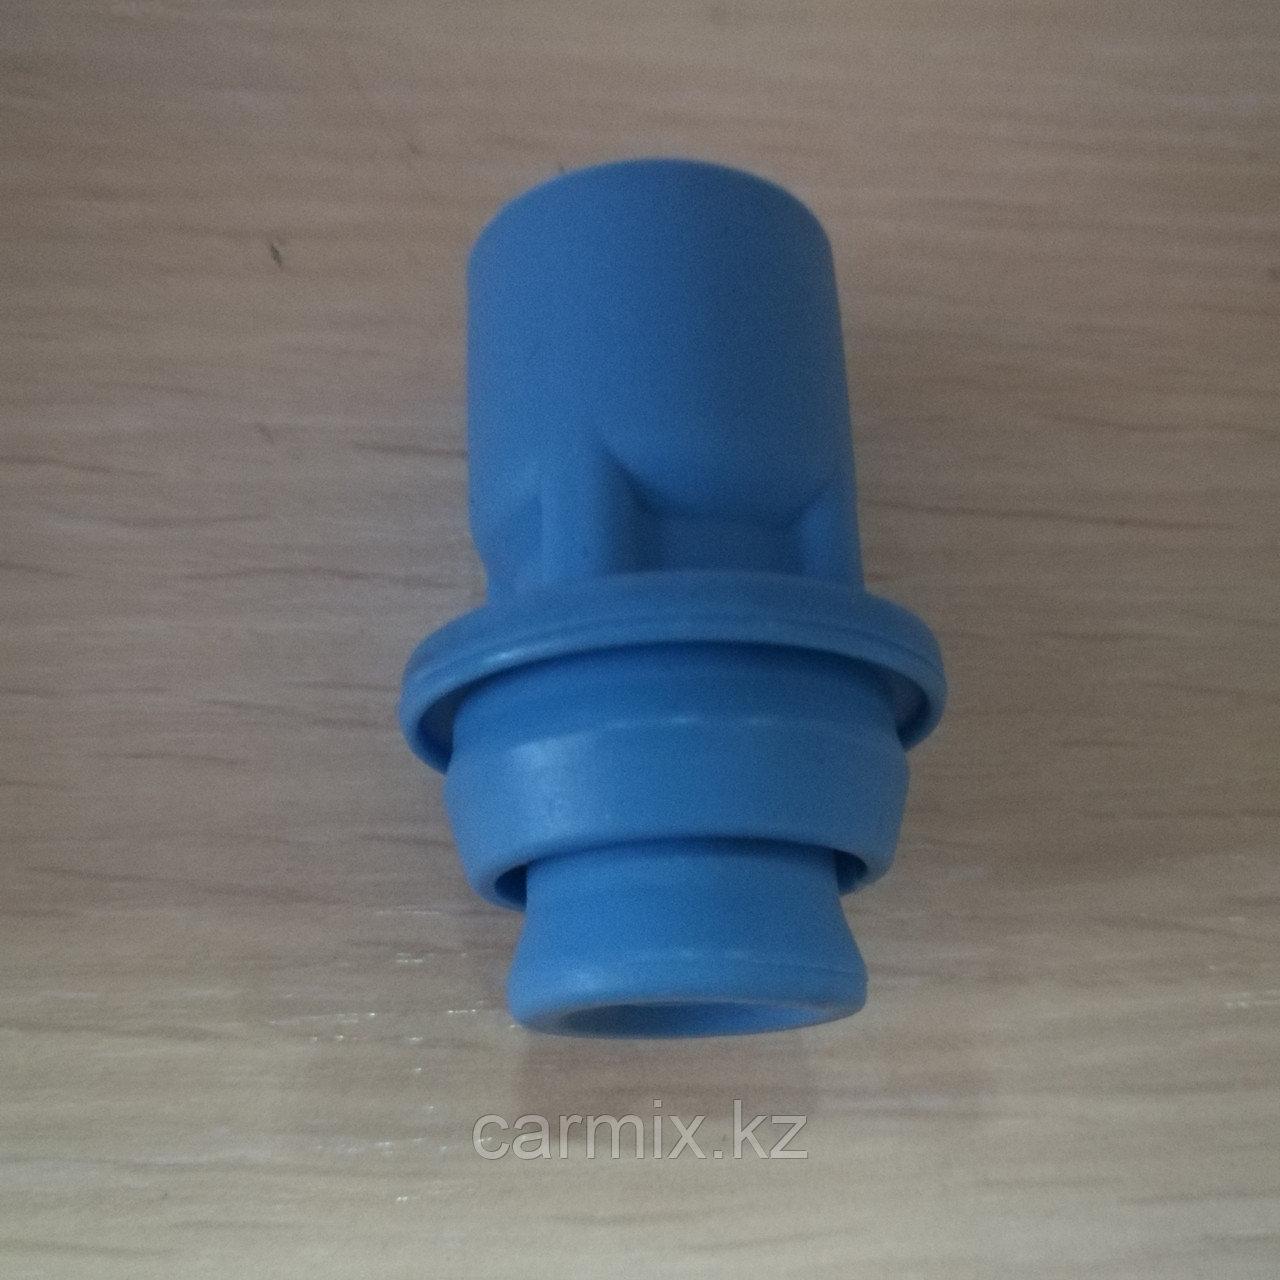 Надсвечник (наконечник) катушки зажигания GS300 JZS160